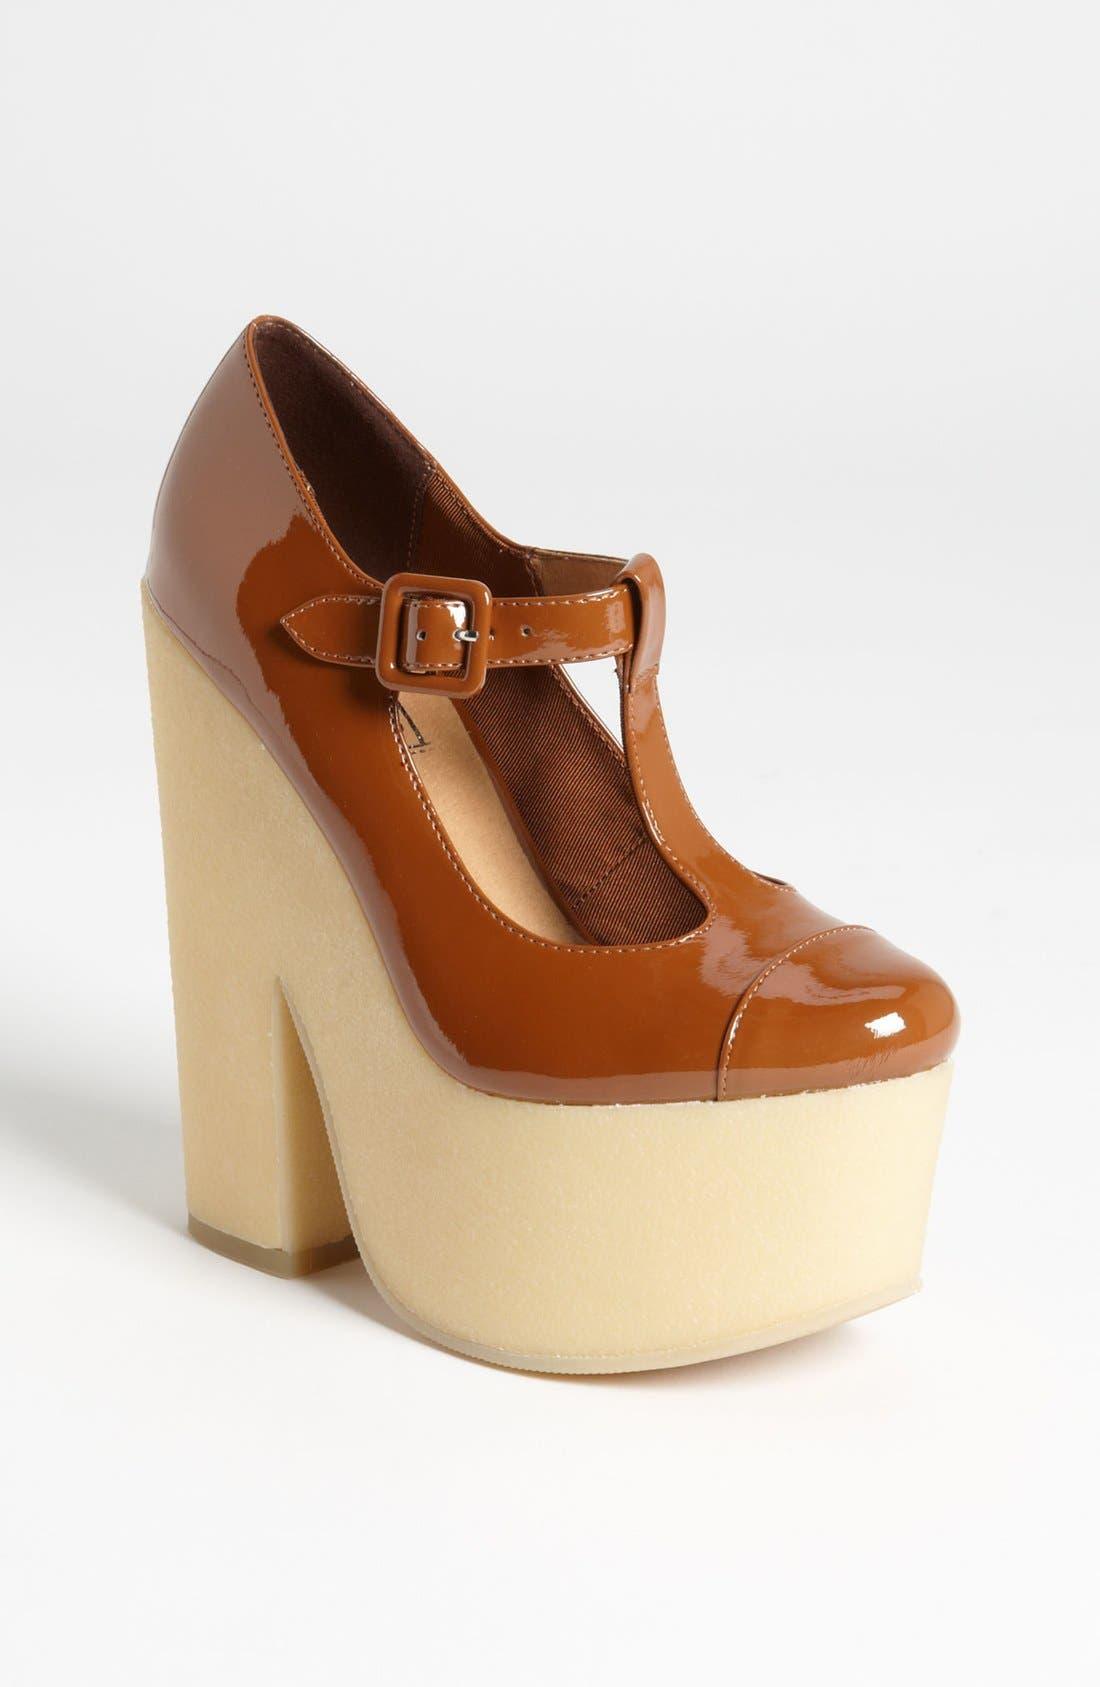 Main Image - Topshop 'Shout' Platform Shoe